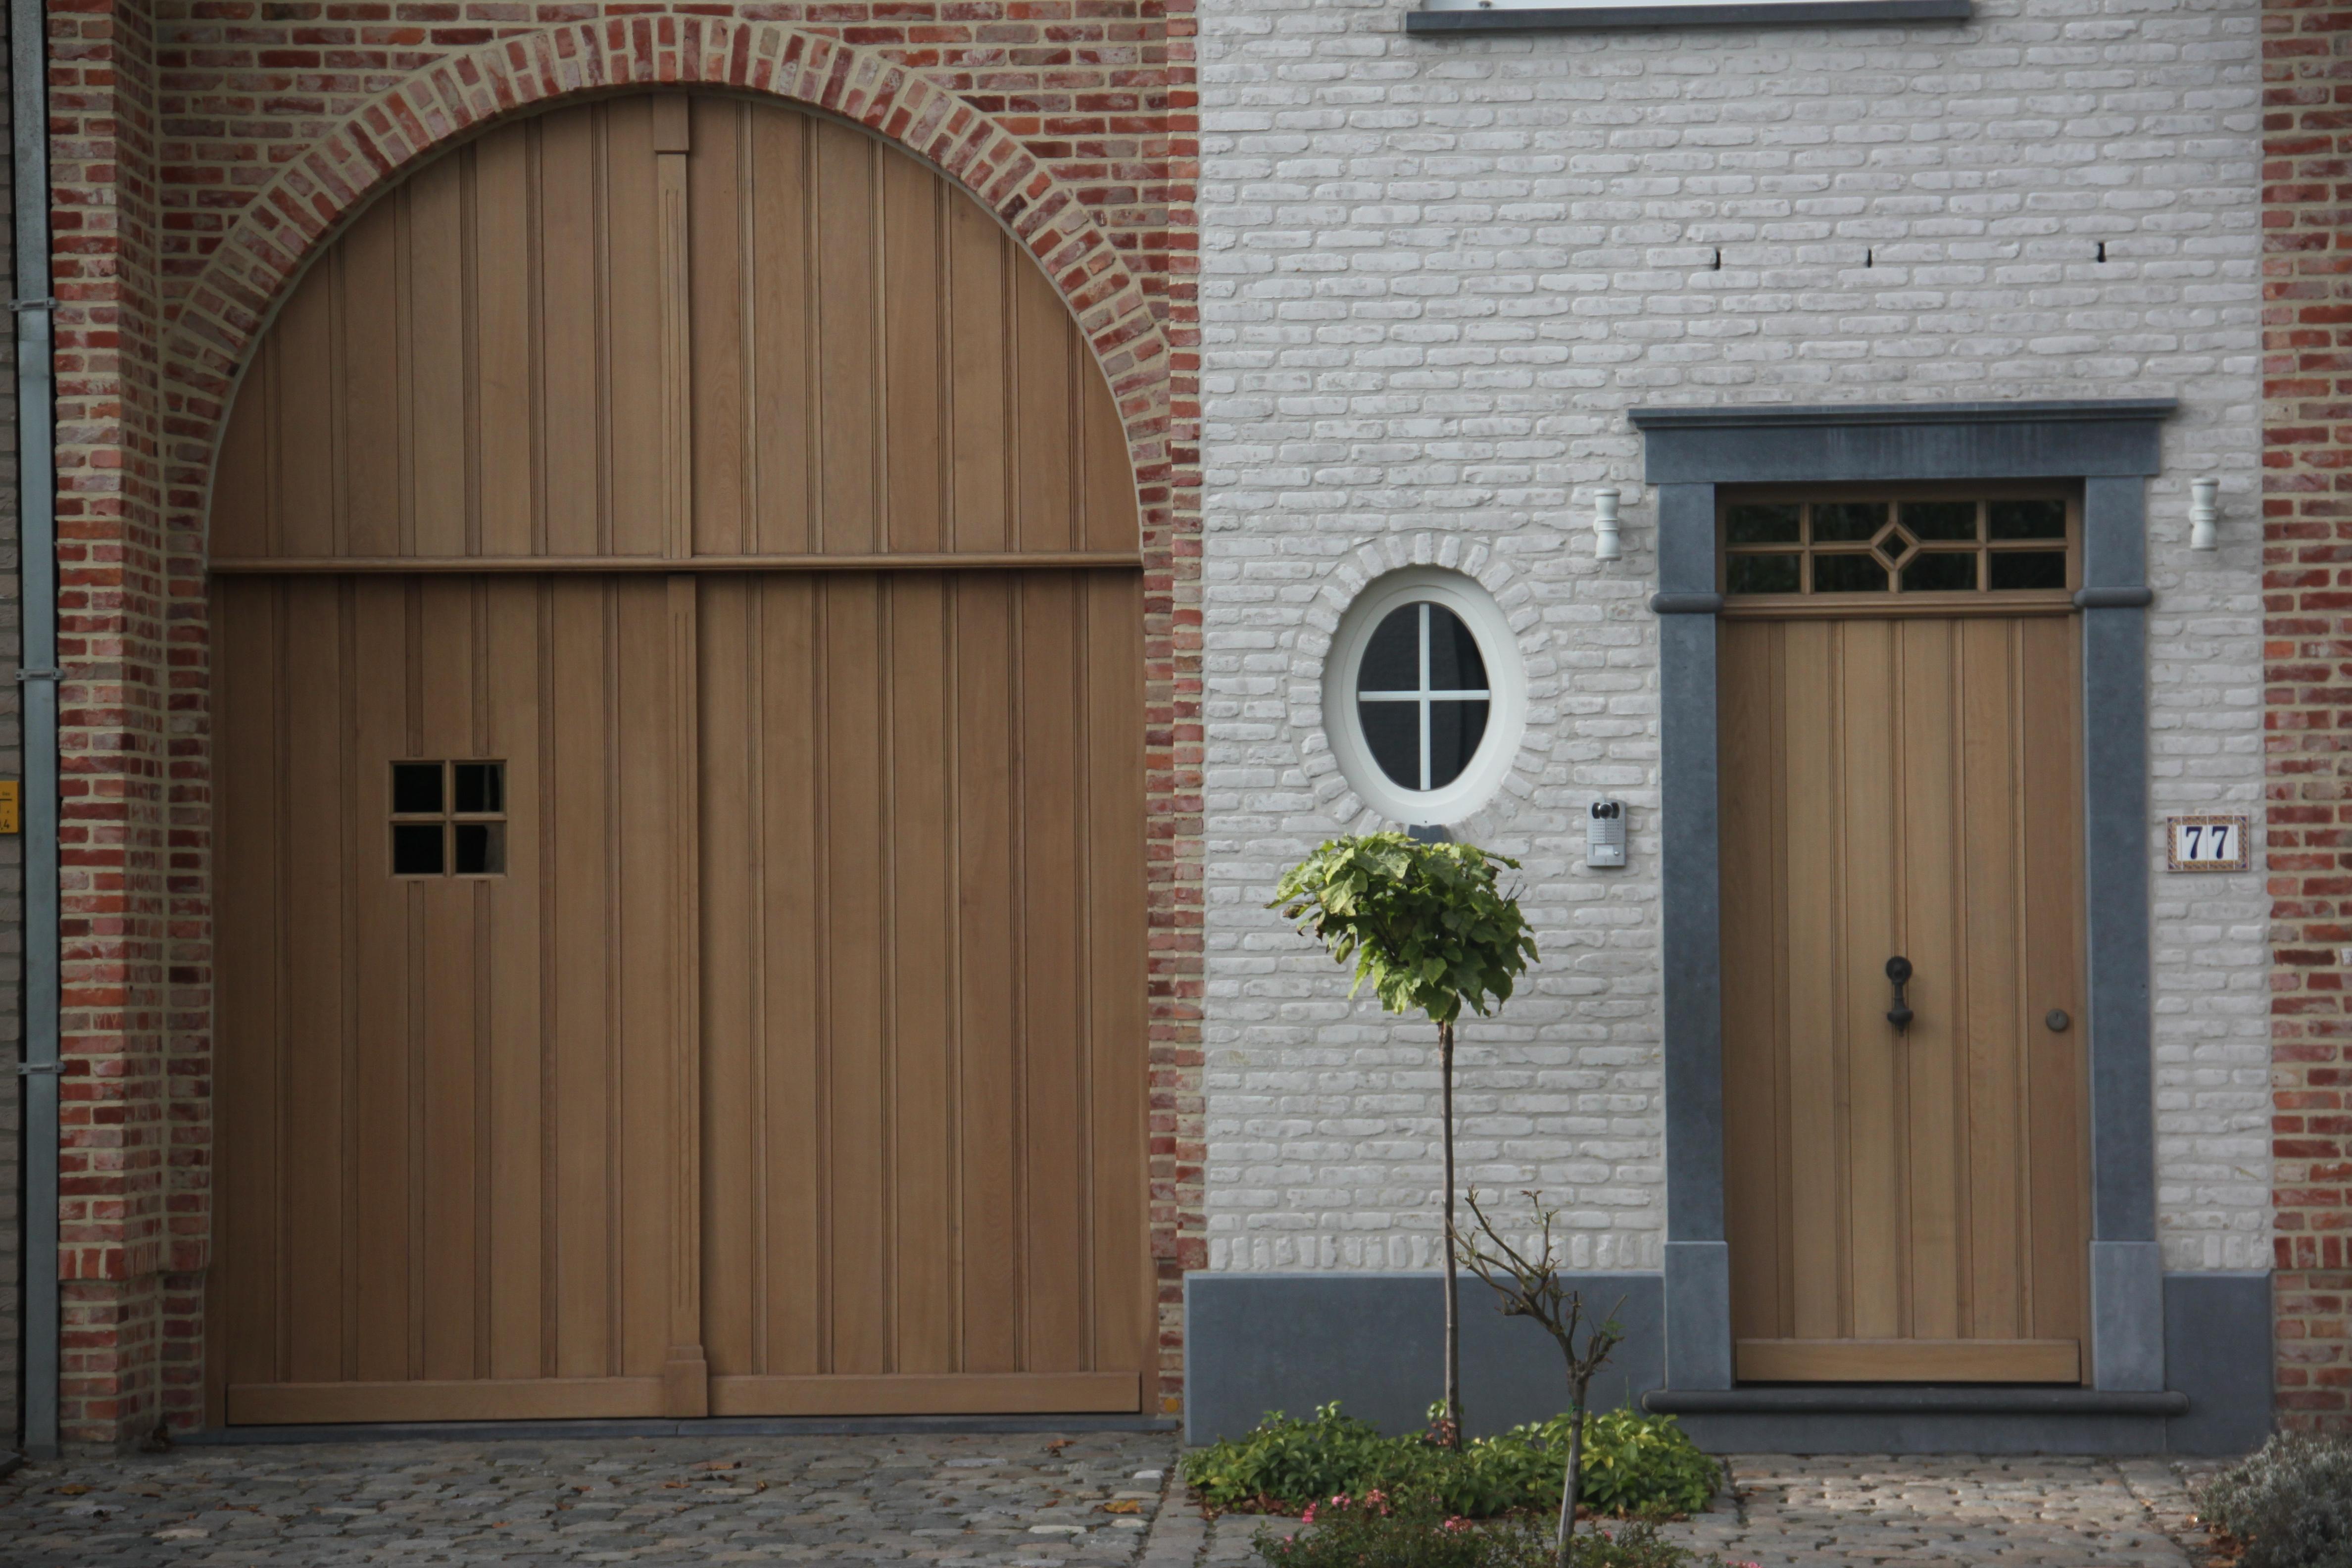 Raam naast voordeur google zoeken ideeën voor ons huis